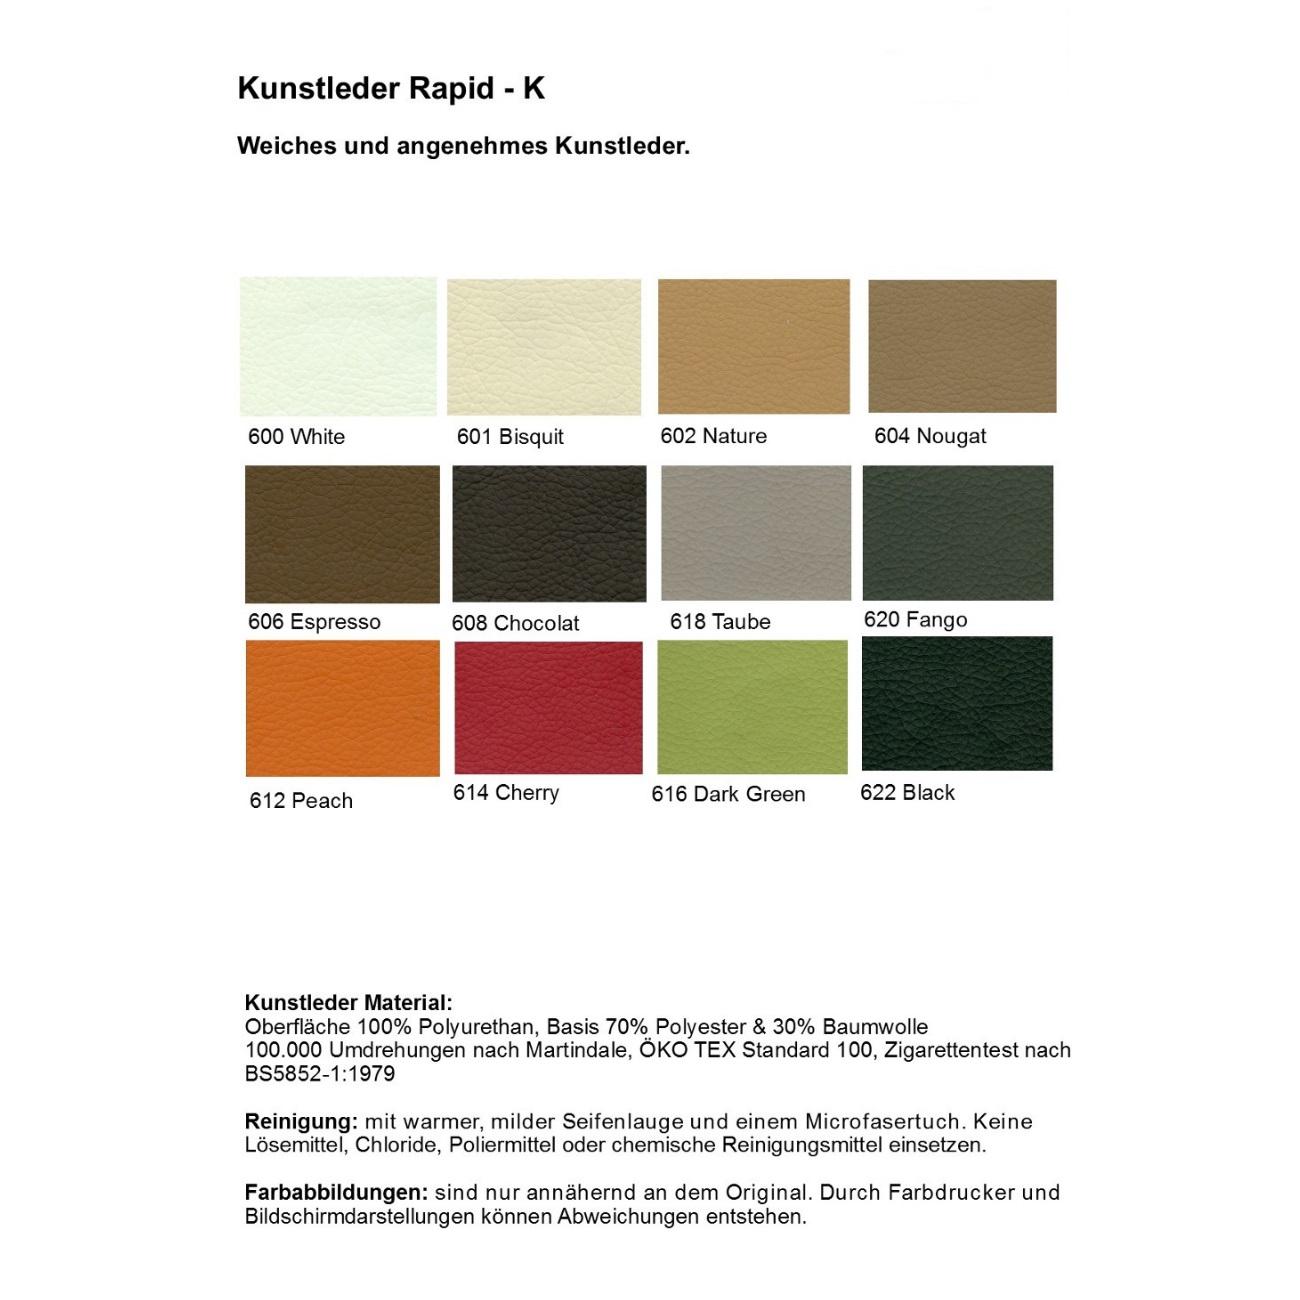 polsterstuhl xxl patientenstuhl f r bergewichtige personen online sanit tshaus. Black Bedroom Furniture Sets. Home Design Ideas